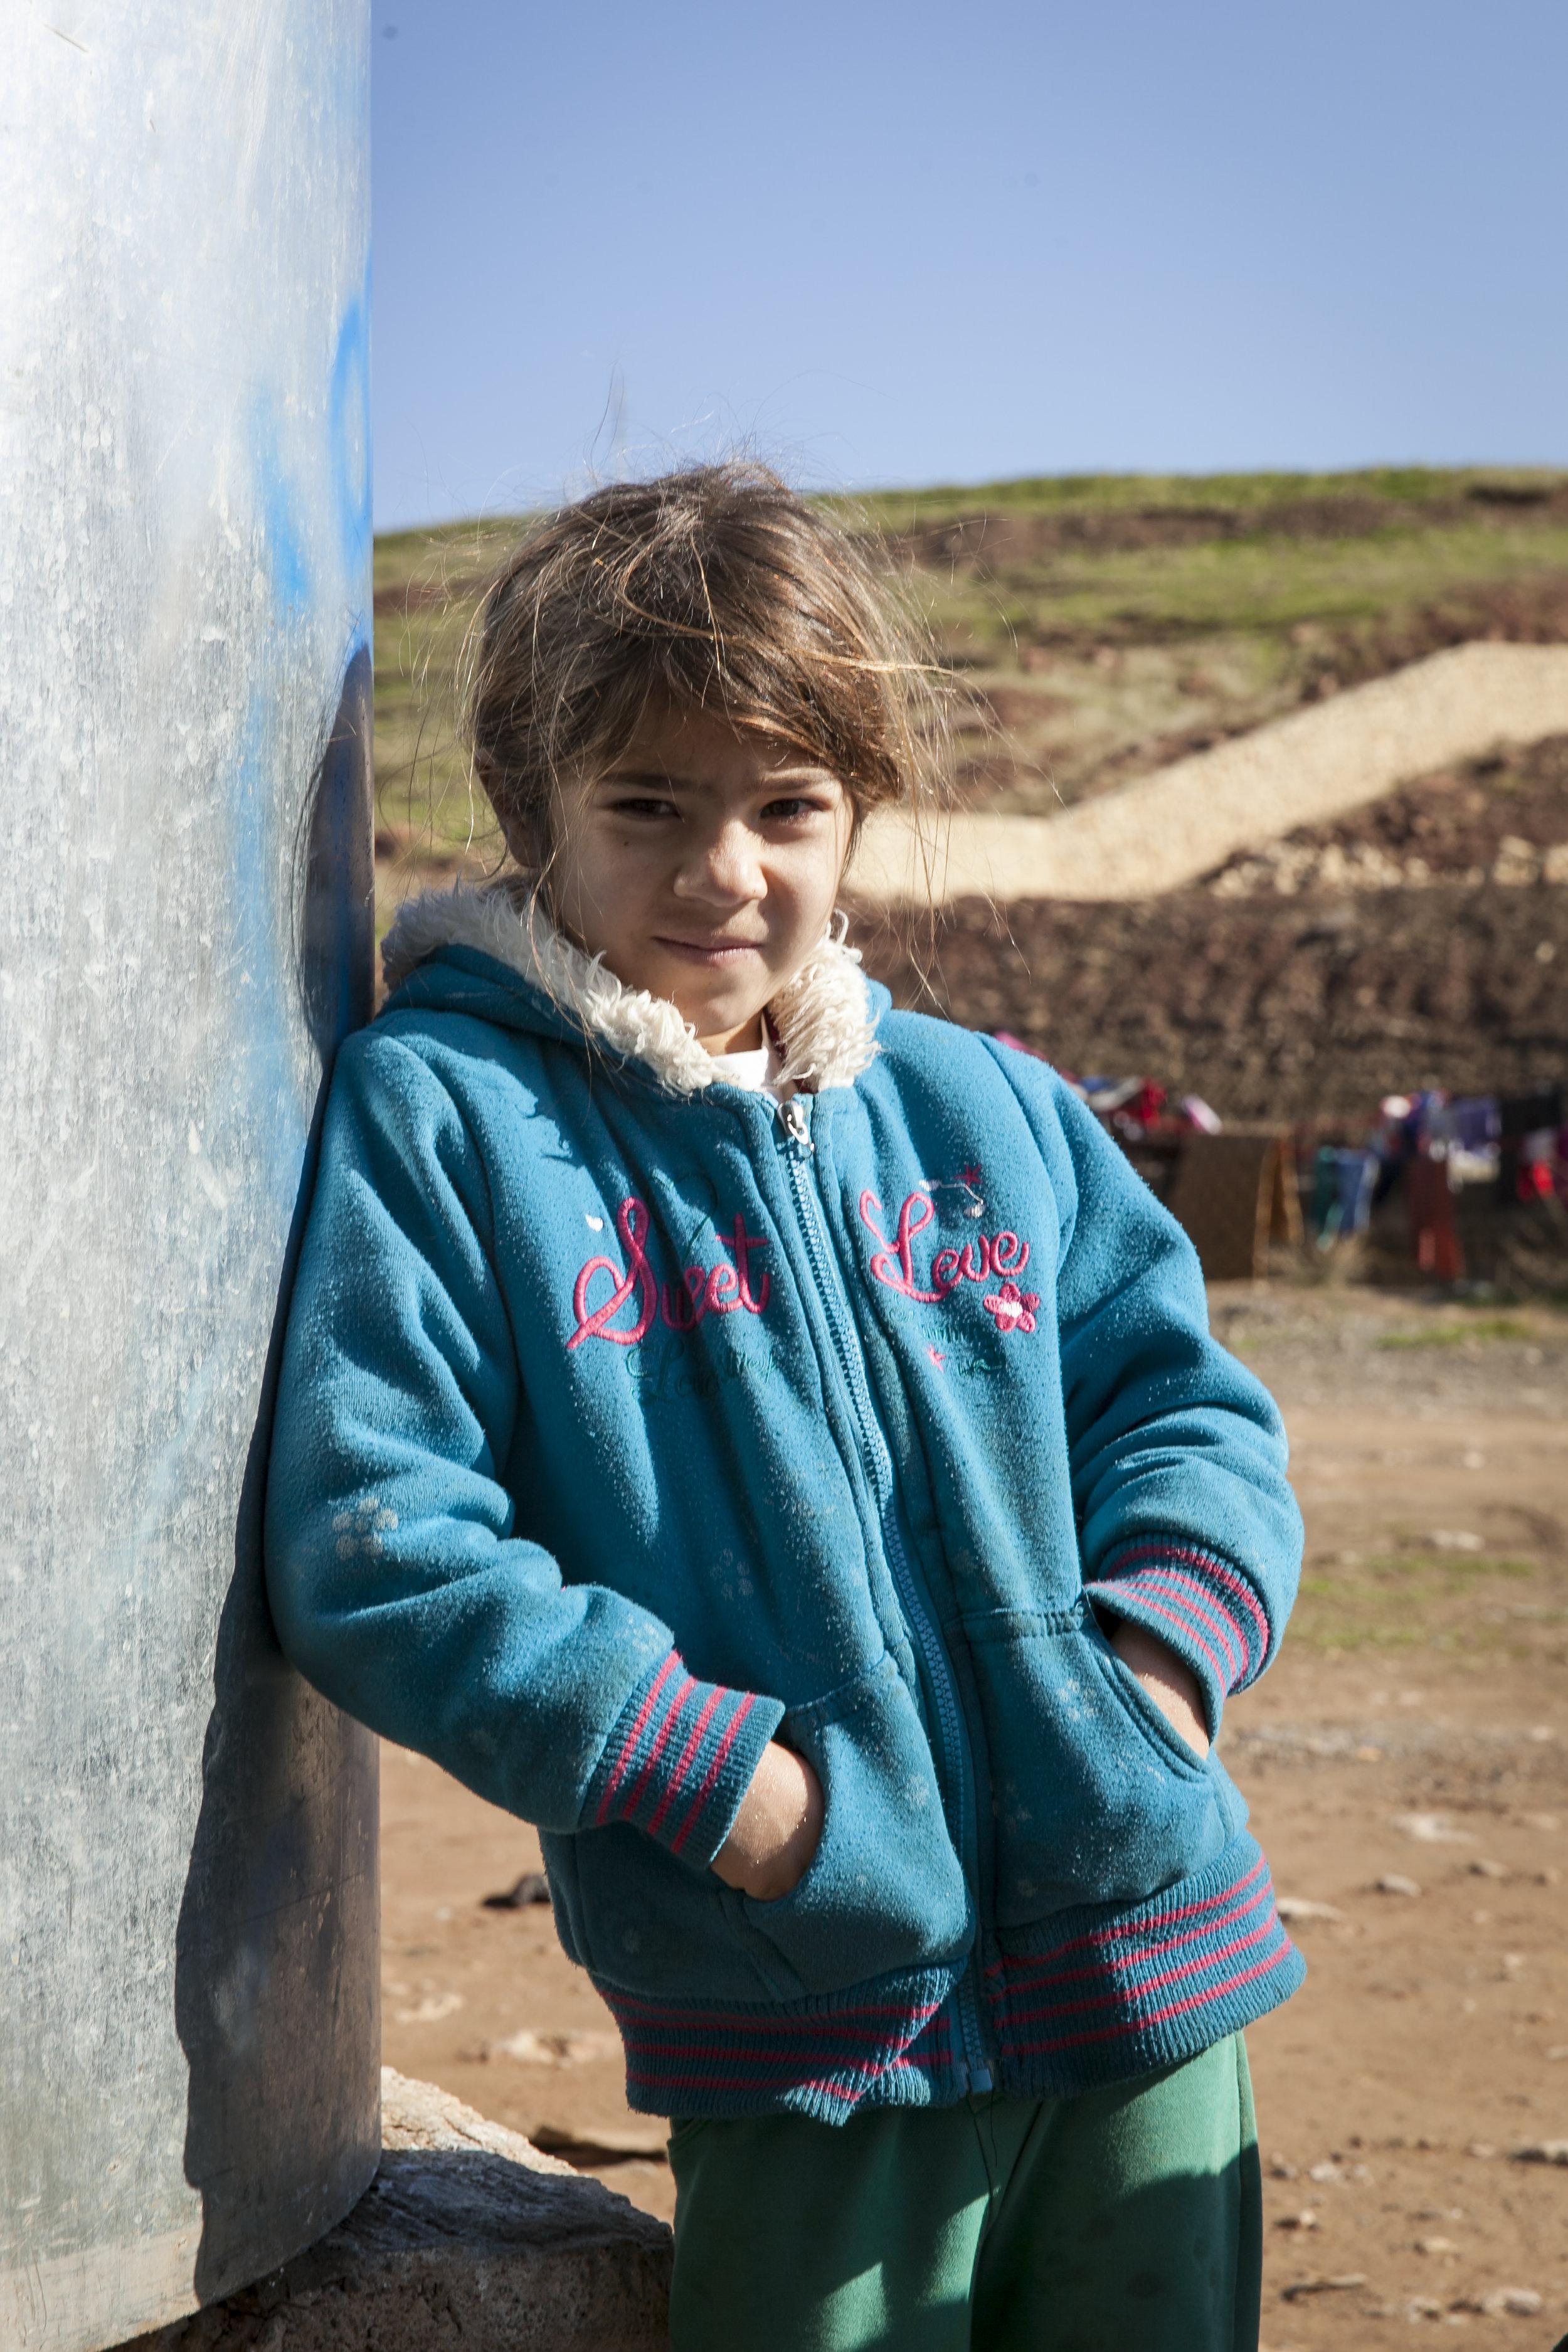 20141204_Refugees_GH_0097.jpg